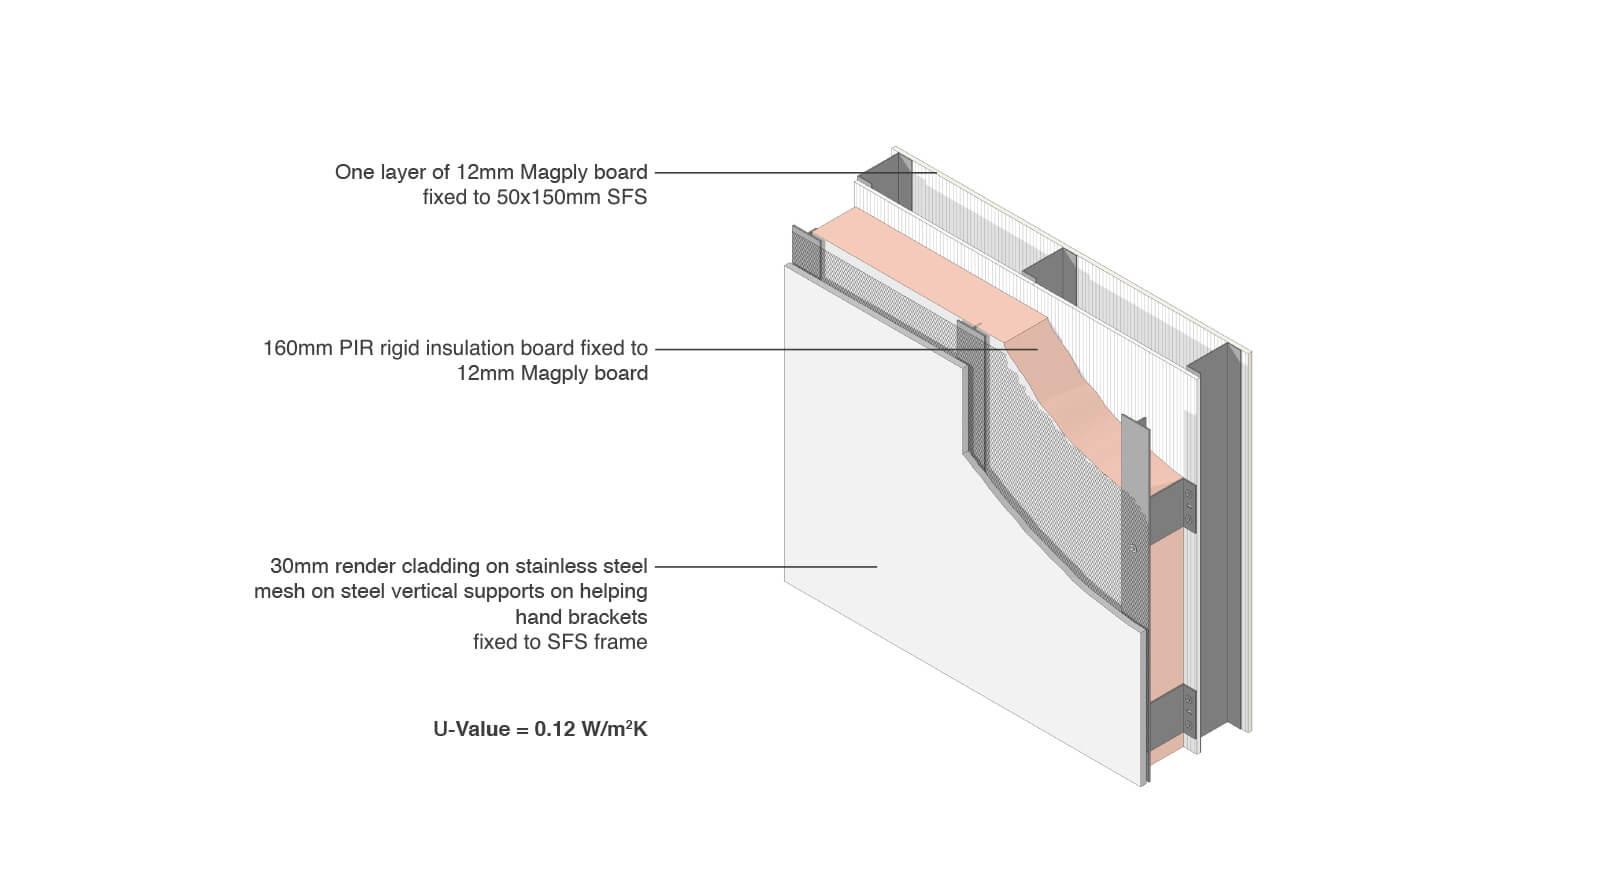 Magply Render Mesh Cladding 3D • Magply